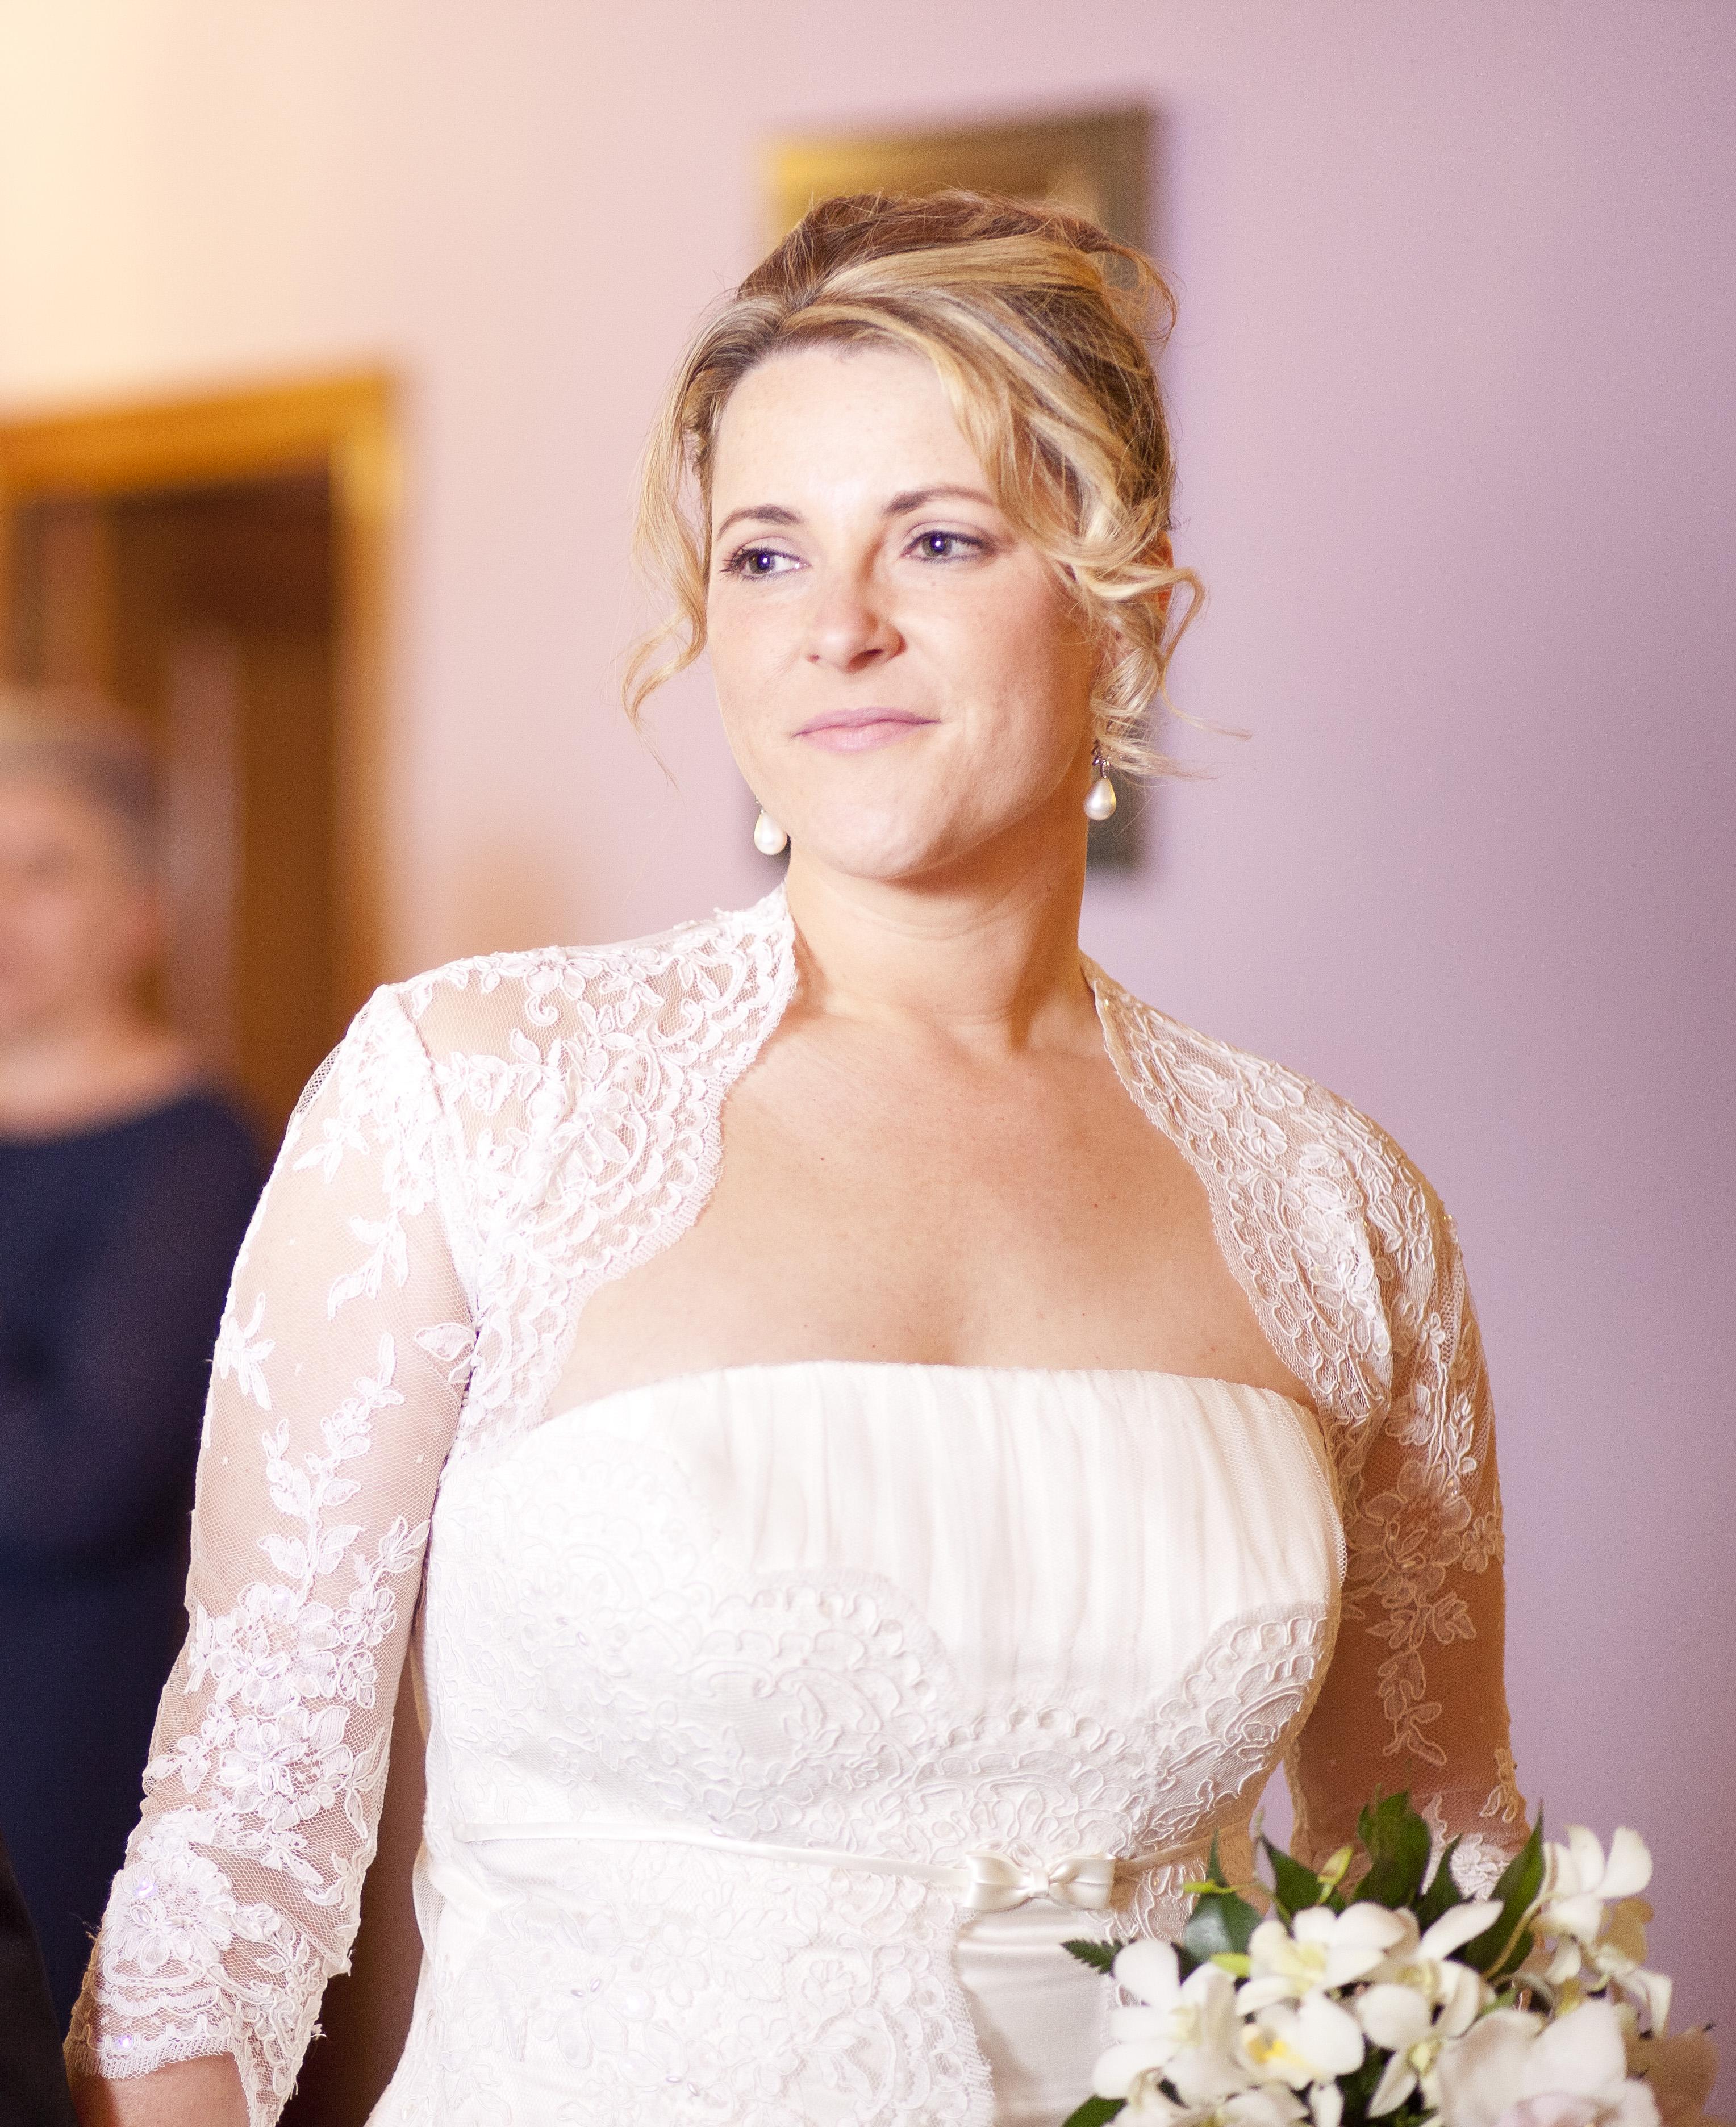 Gelen novias – T44 | Weddalia